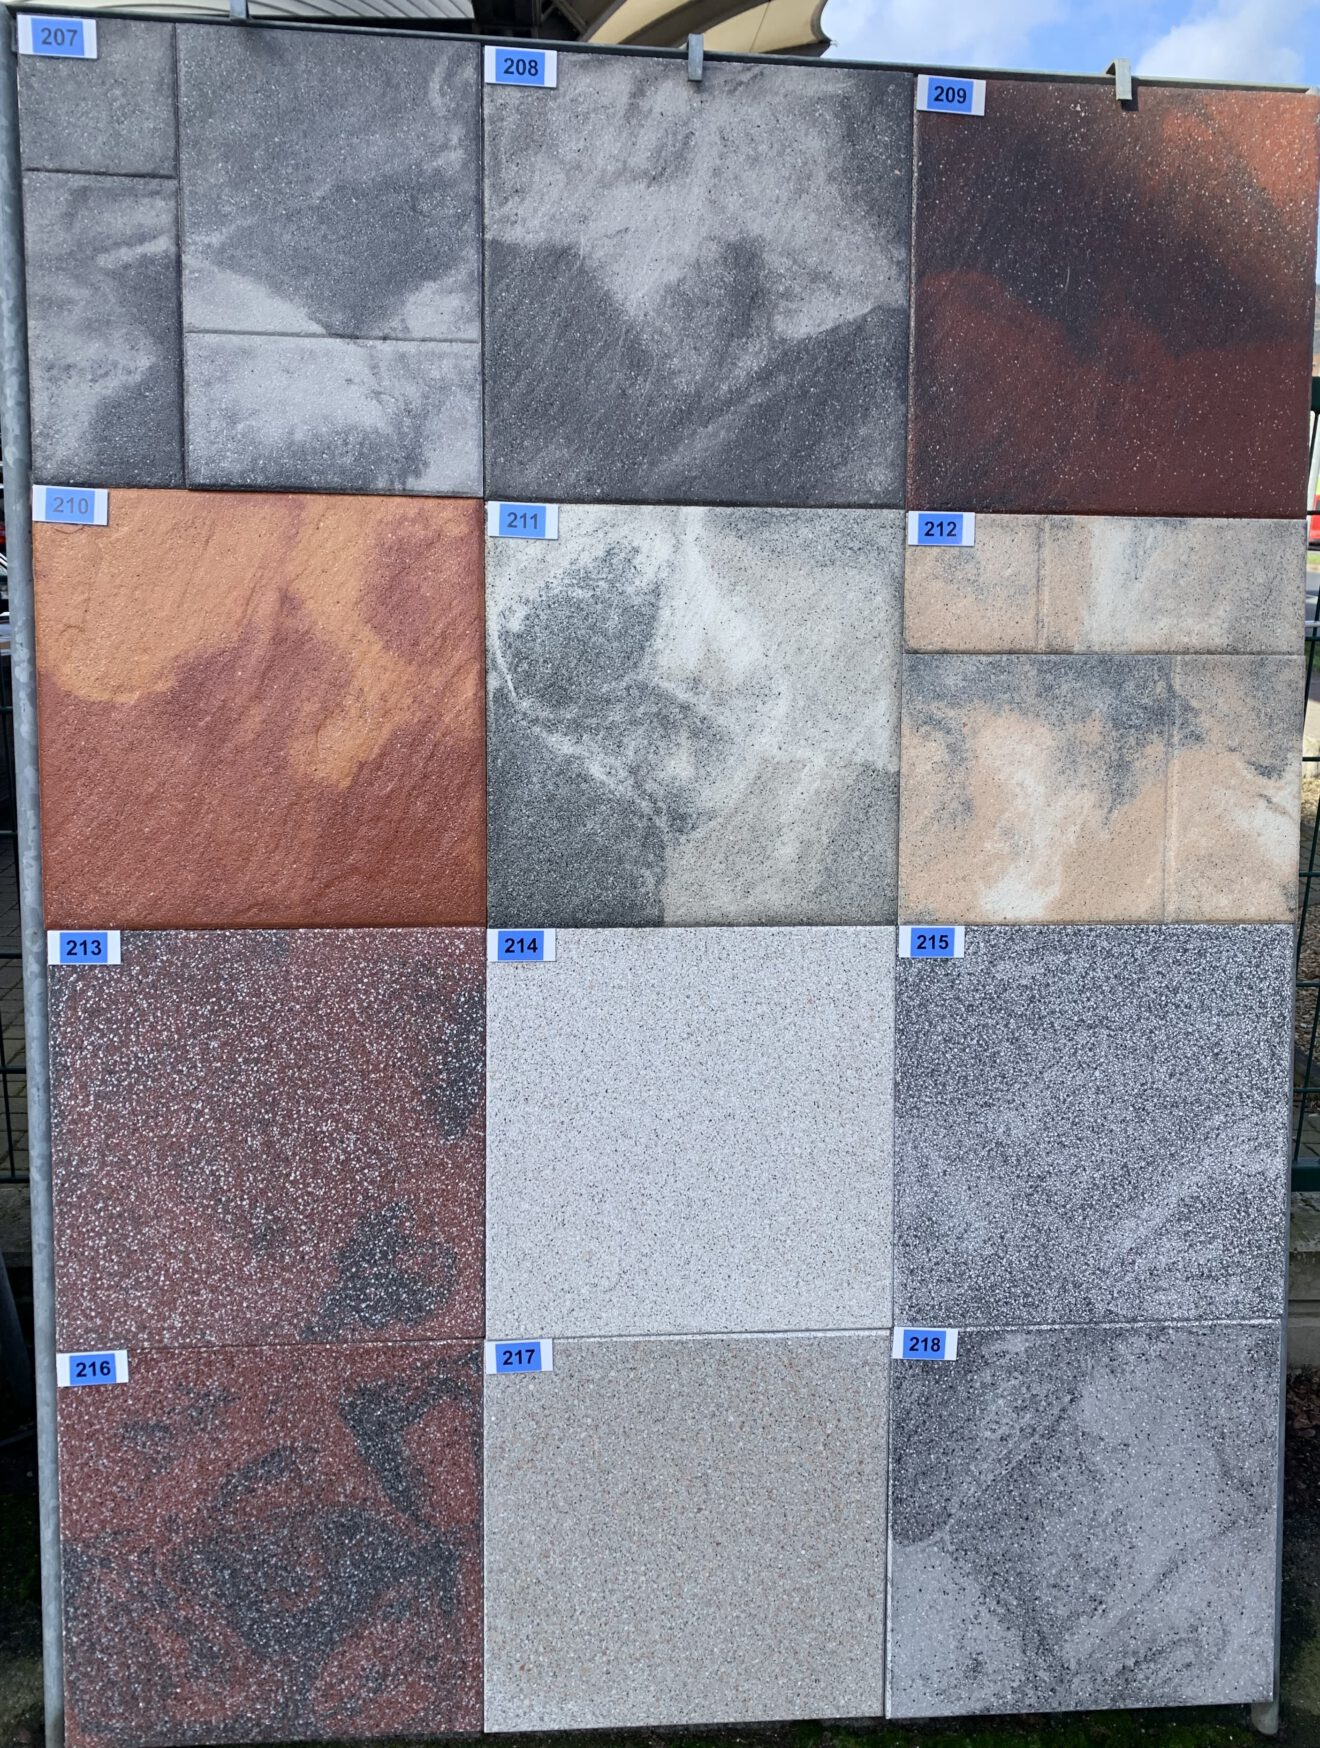 Terrassenplatte Novaclean Rustikano 1 bei Stolzenbach Baustoffe in Bremen kaufen